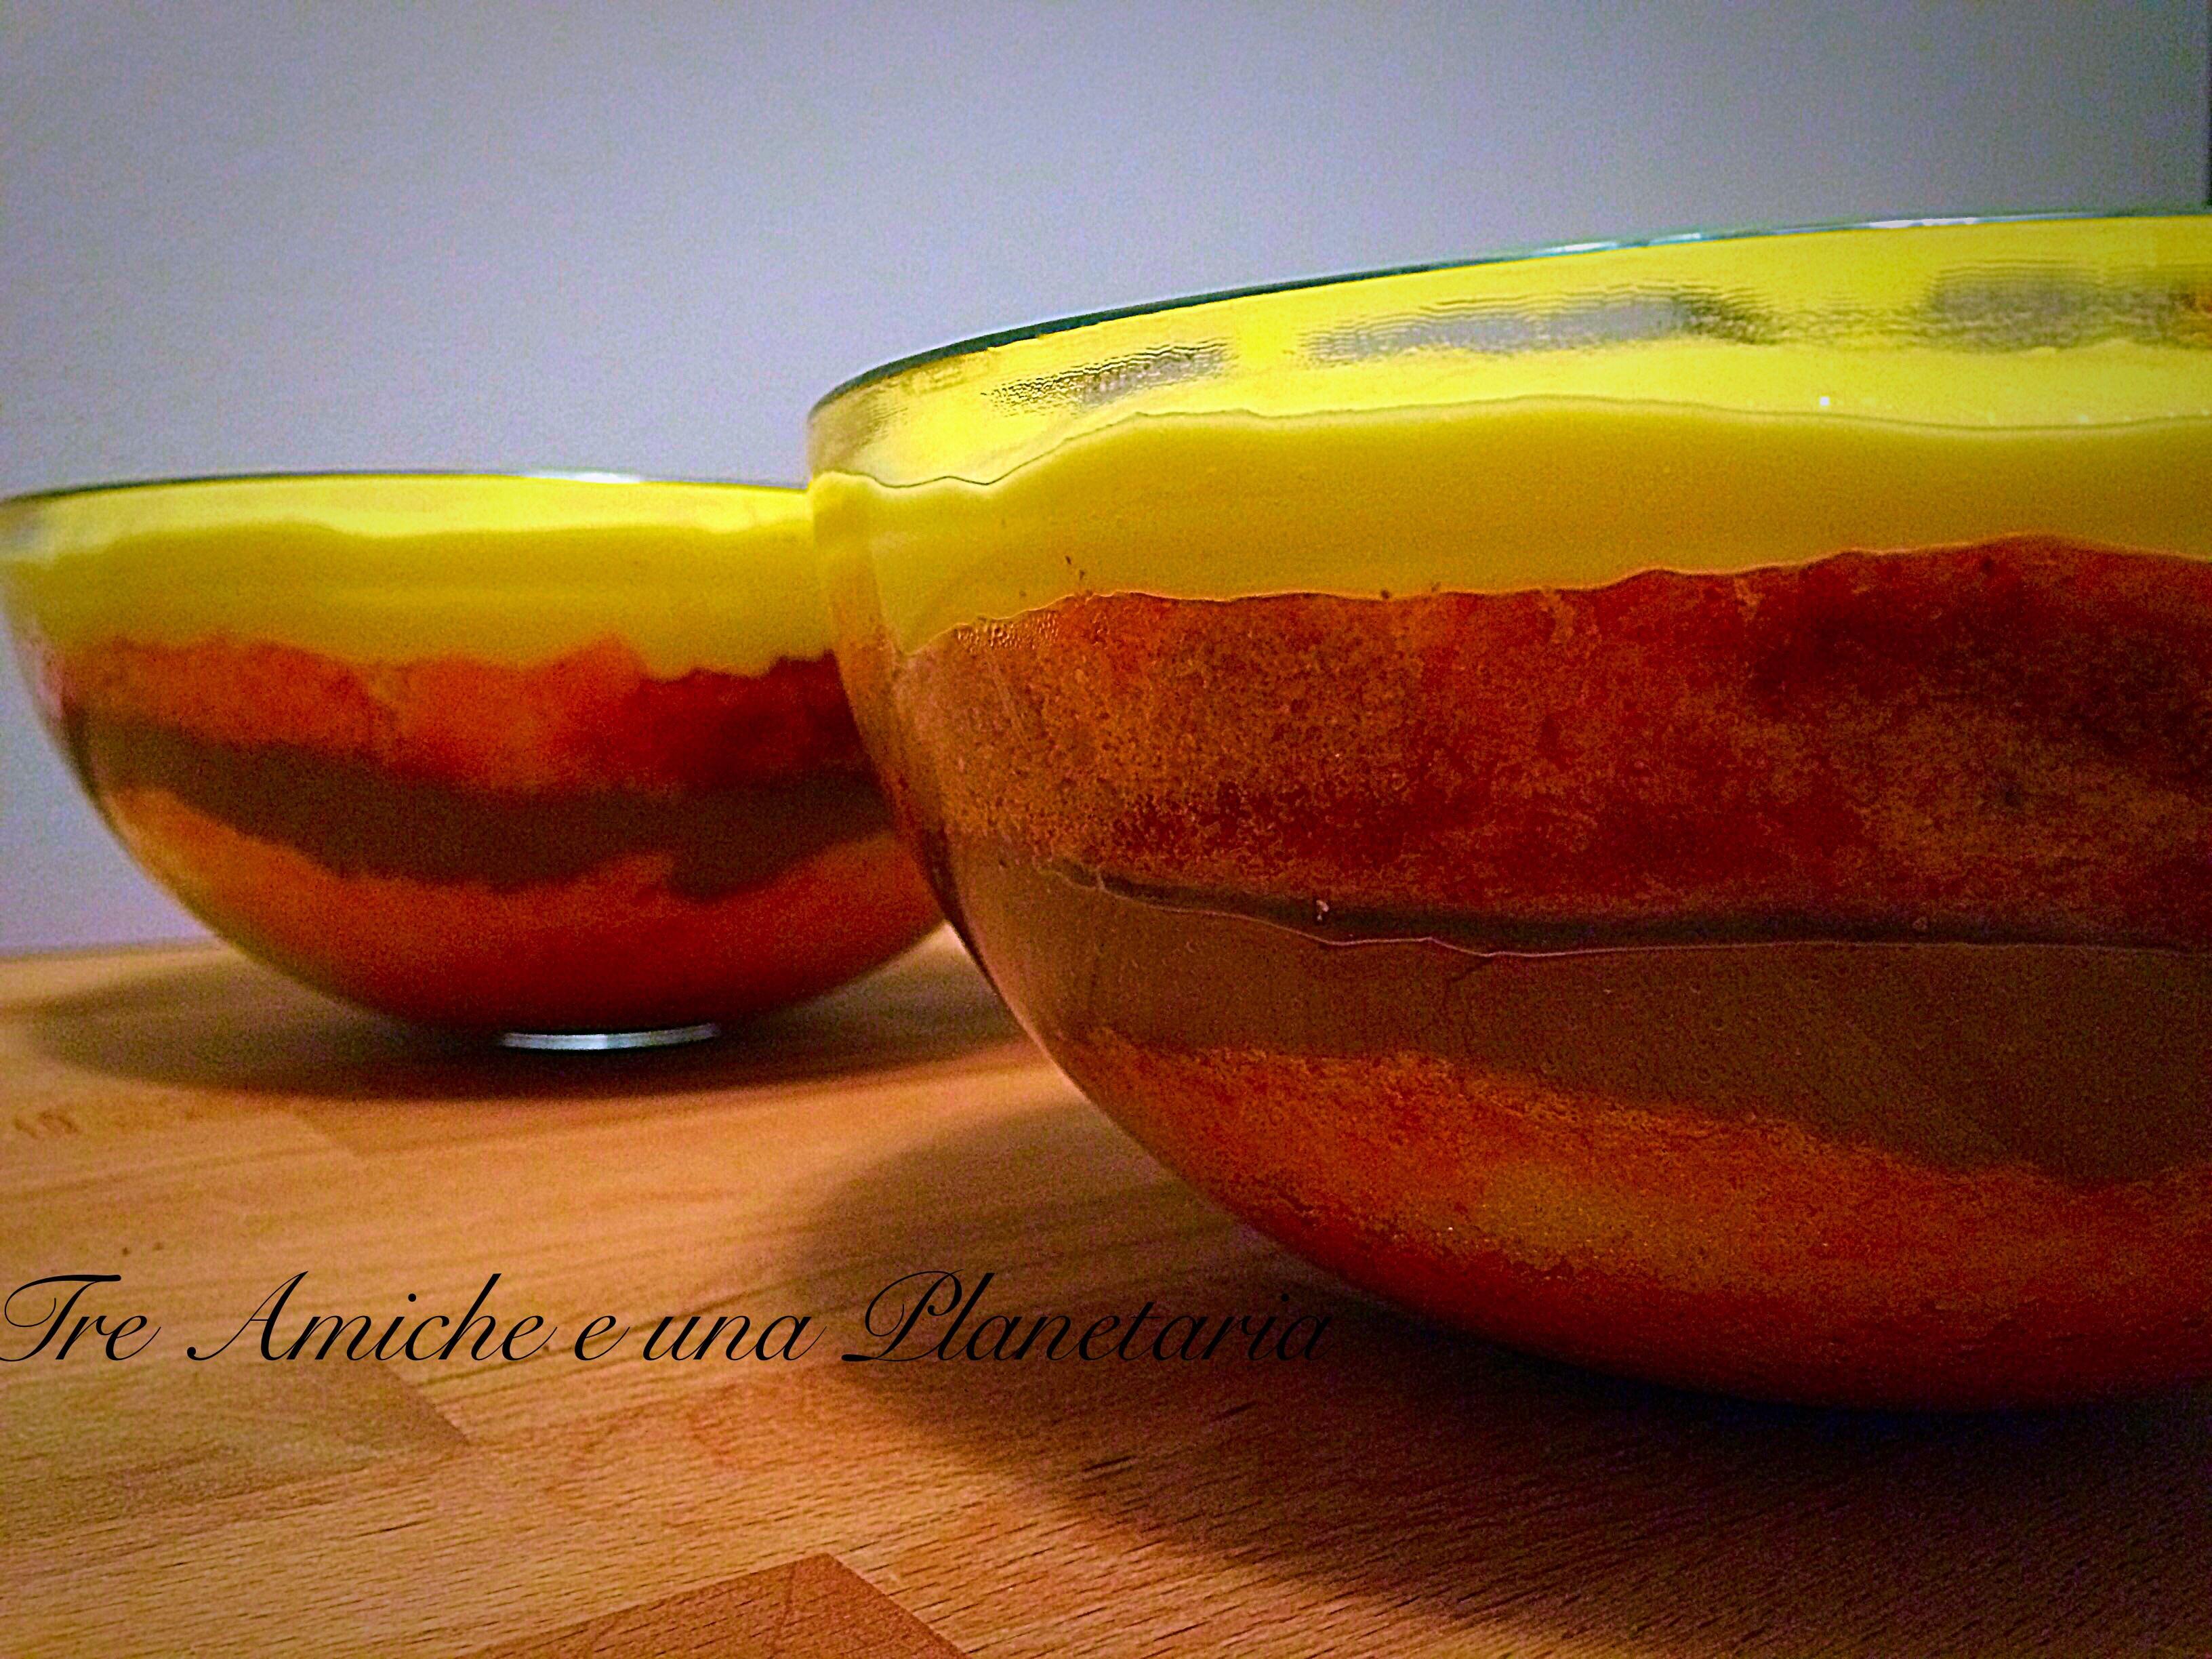 Bagna per zuppa inglese pane marmellata maggio u viraltweets club